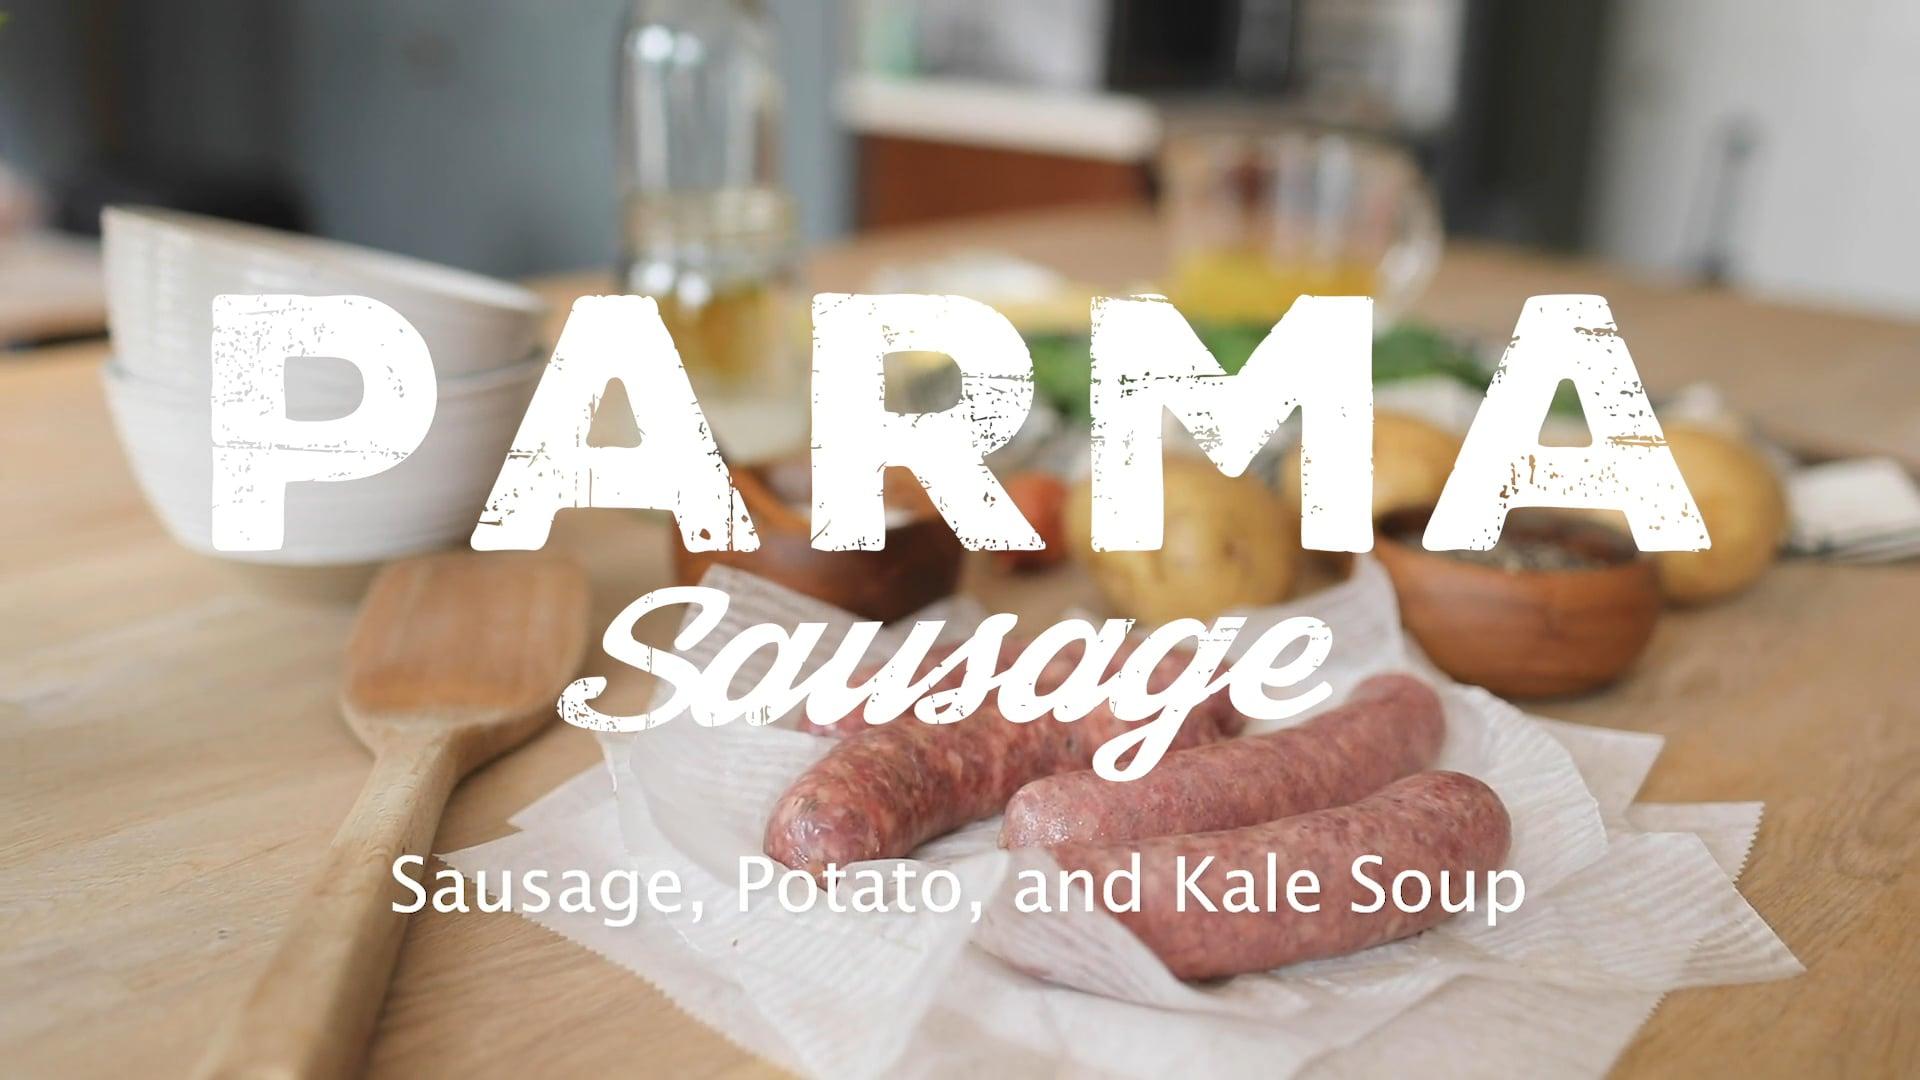 Parma Fall Recipe